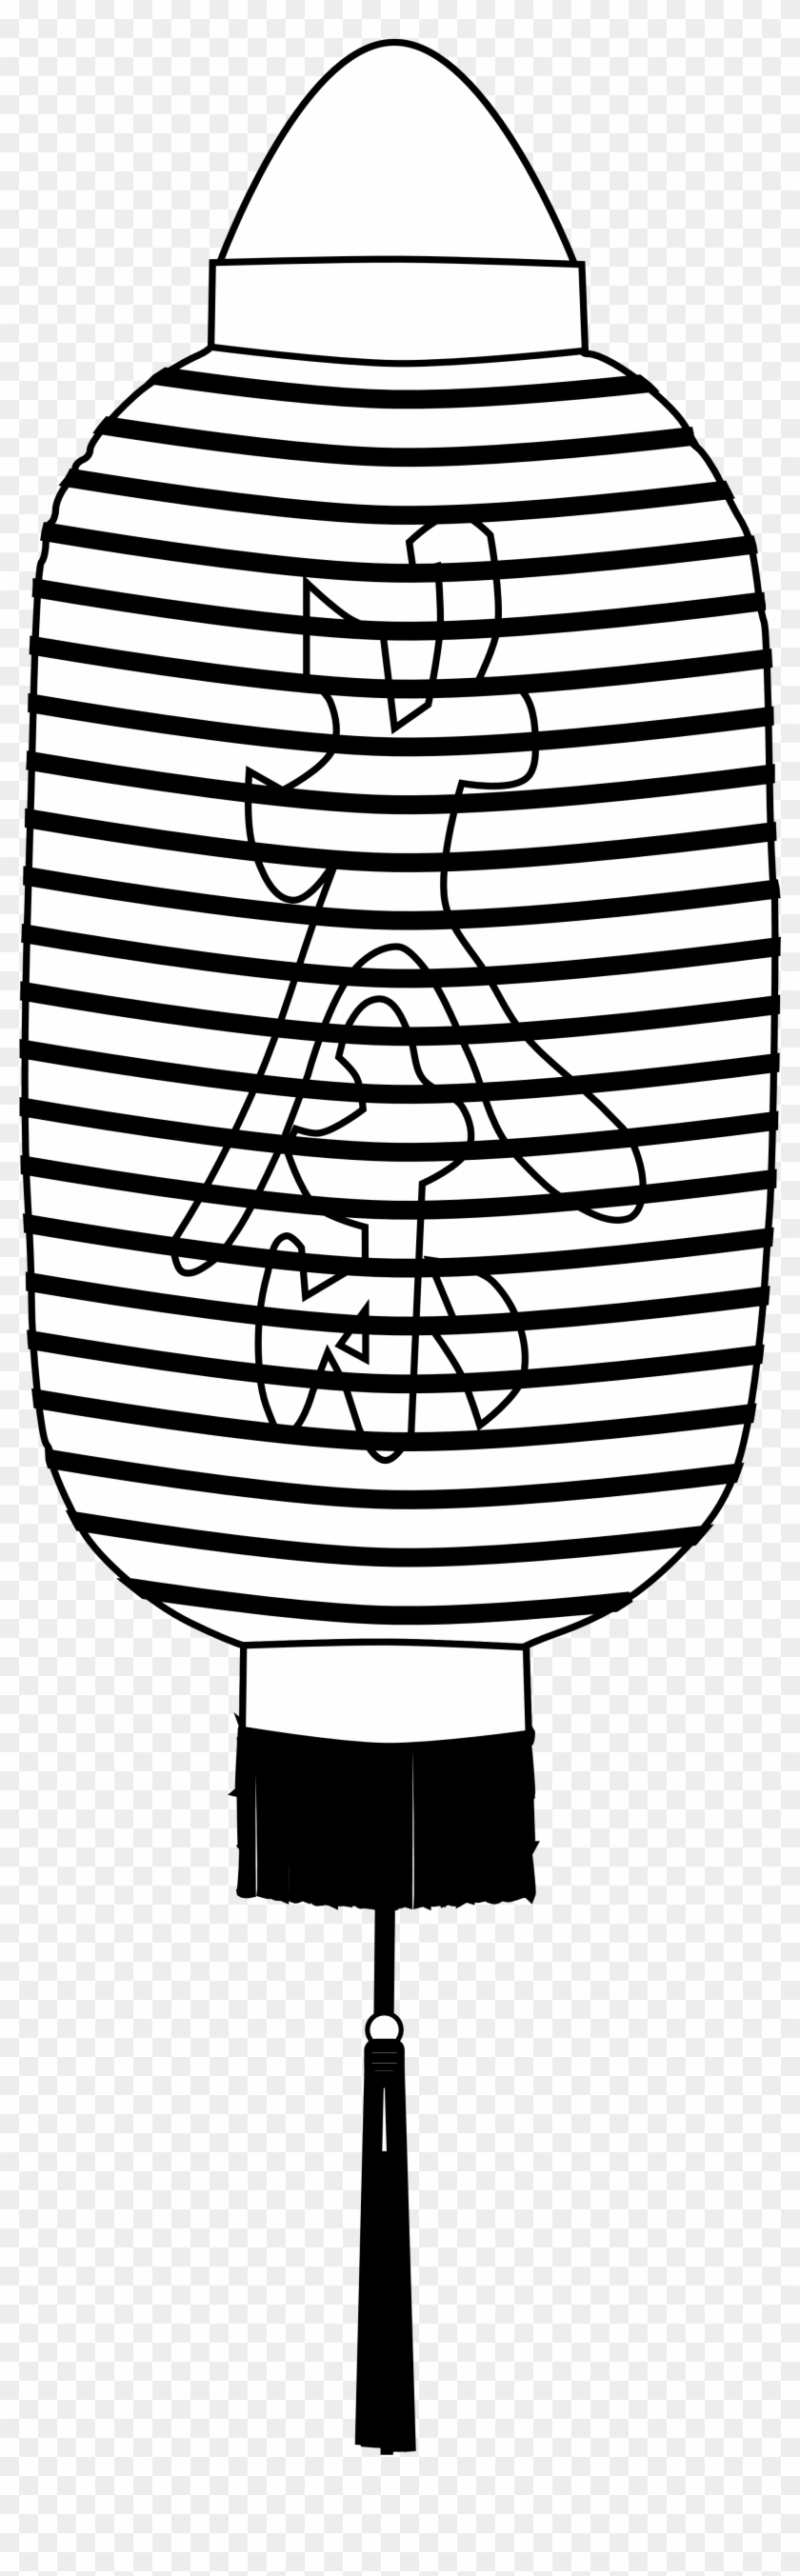 840x2705 chinese lantern chinese lantern black white line chinese